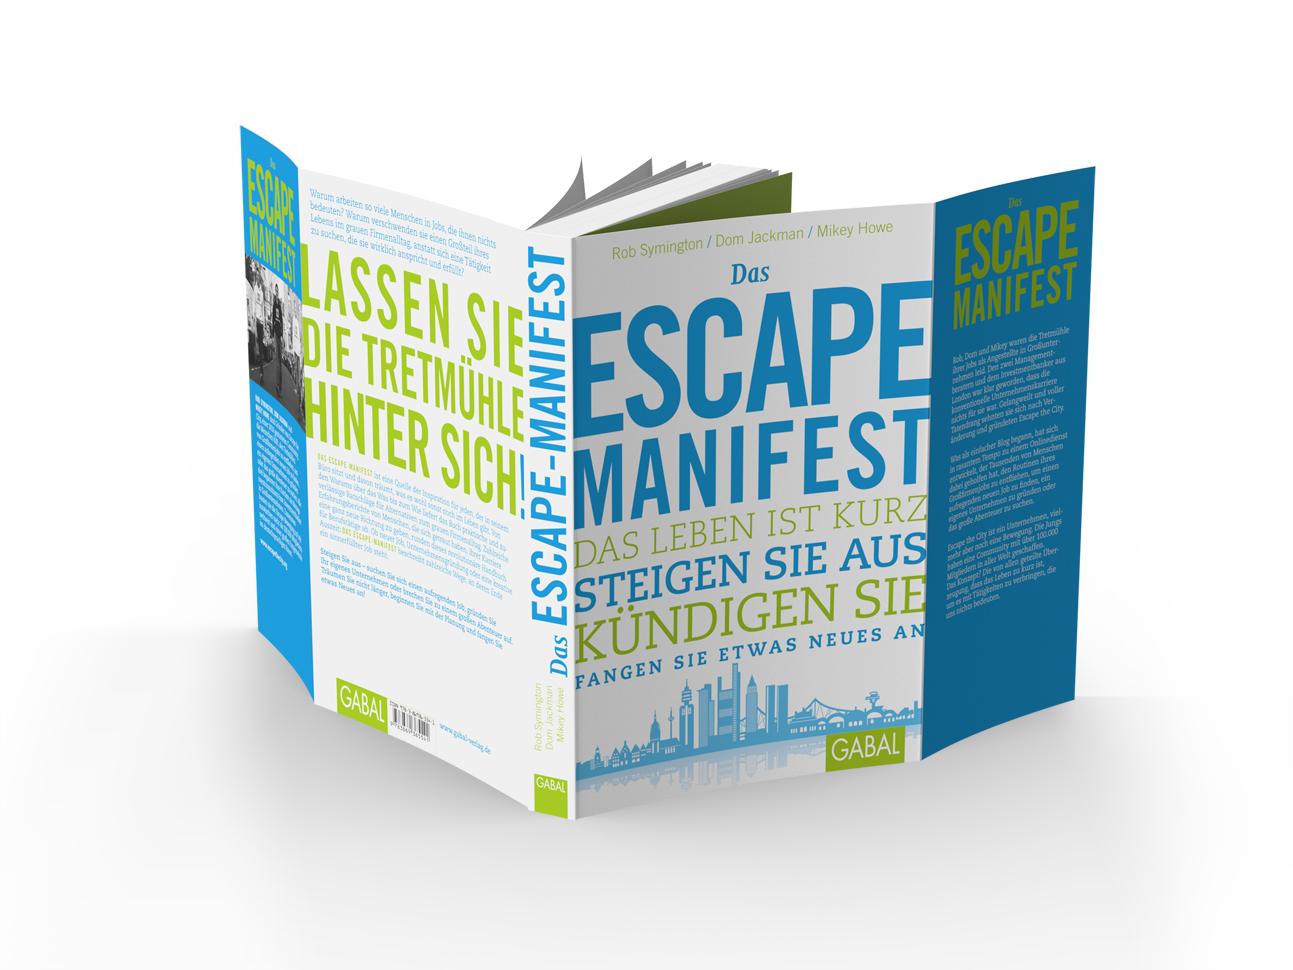 martin_zech_design_buchcovergestaltung_gabal_verlag_symington-escape-manifest